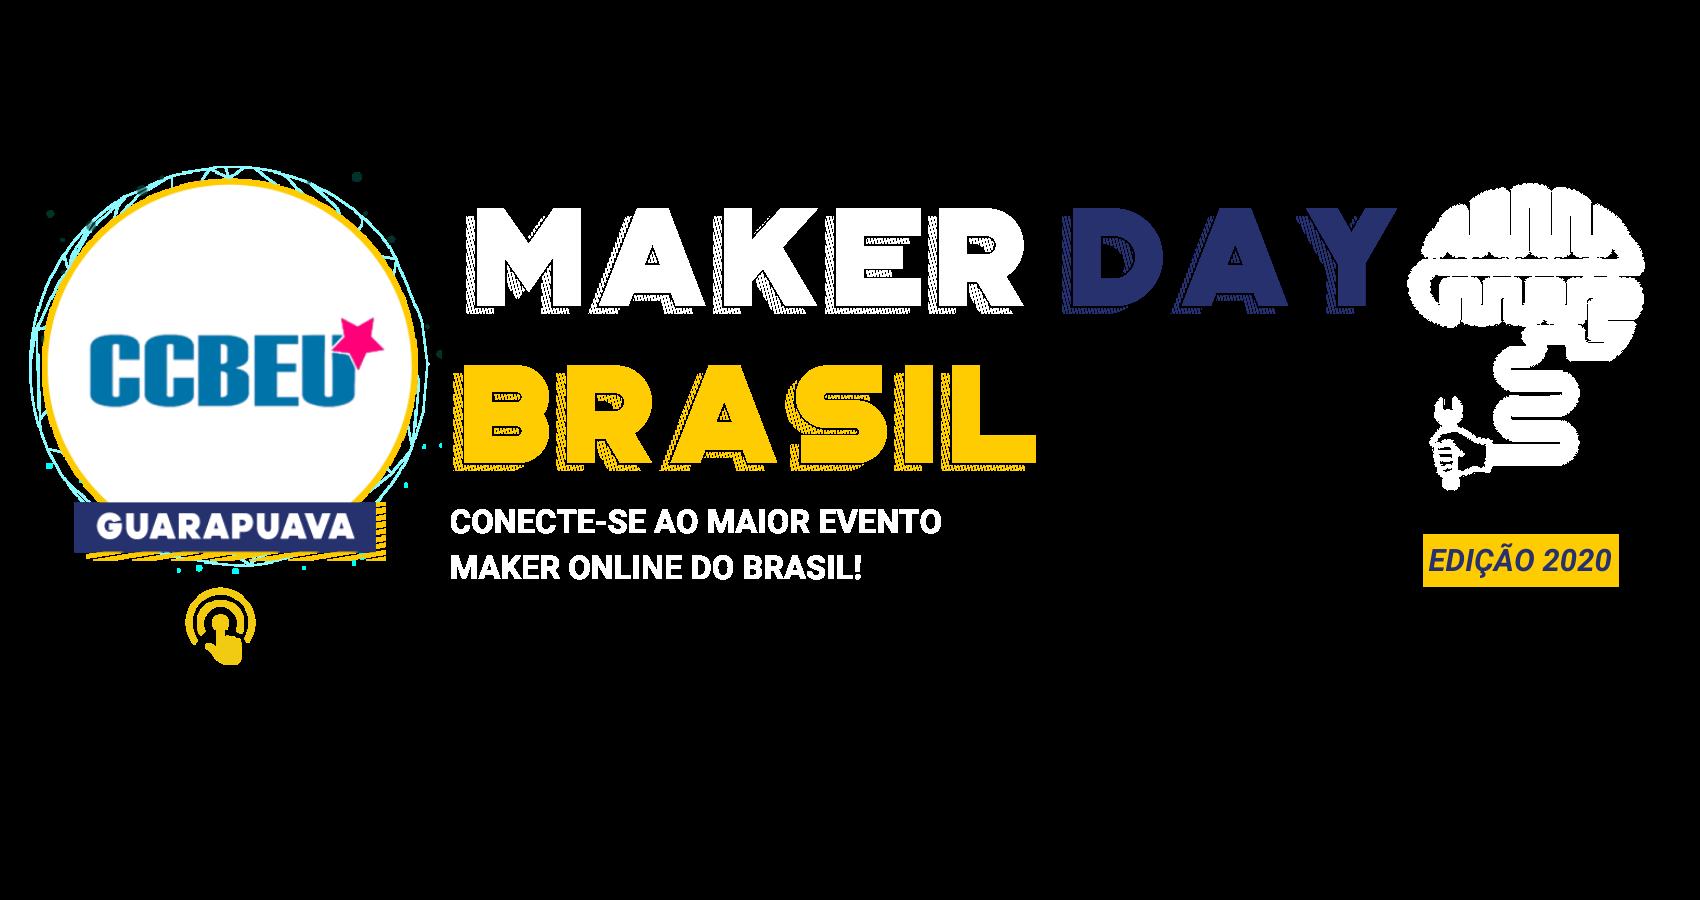 Maker Day Brasil Capa Guarapuava